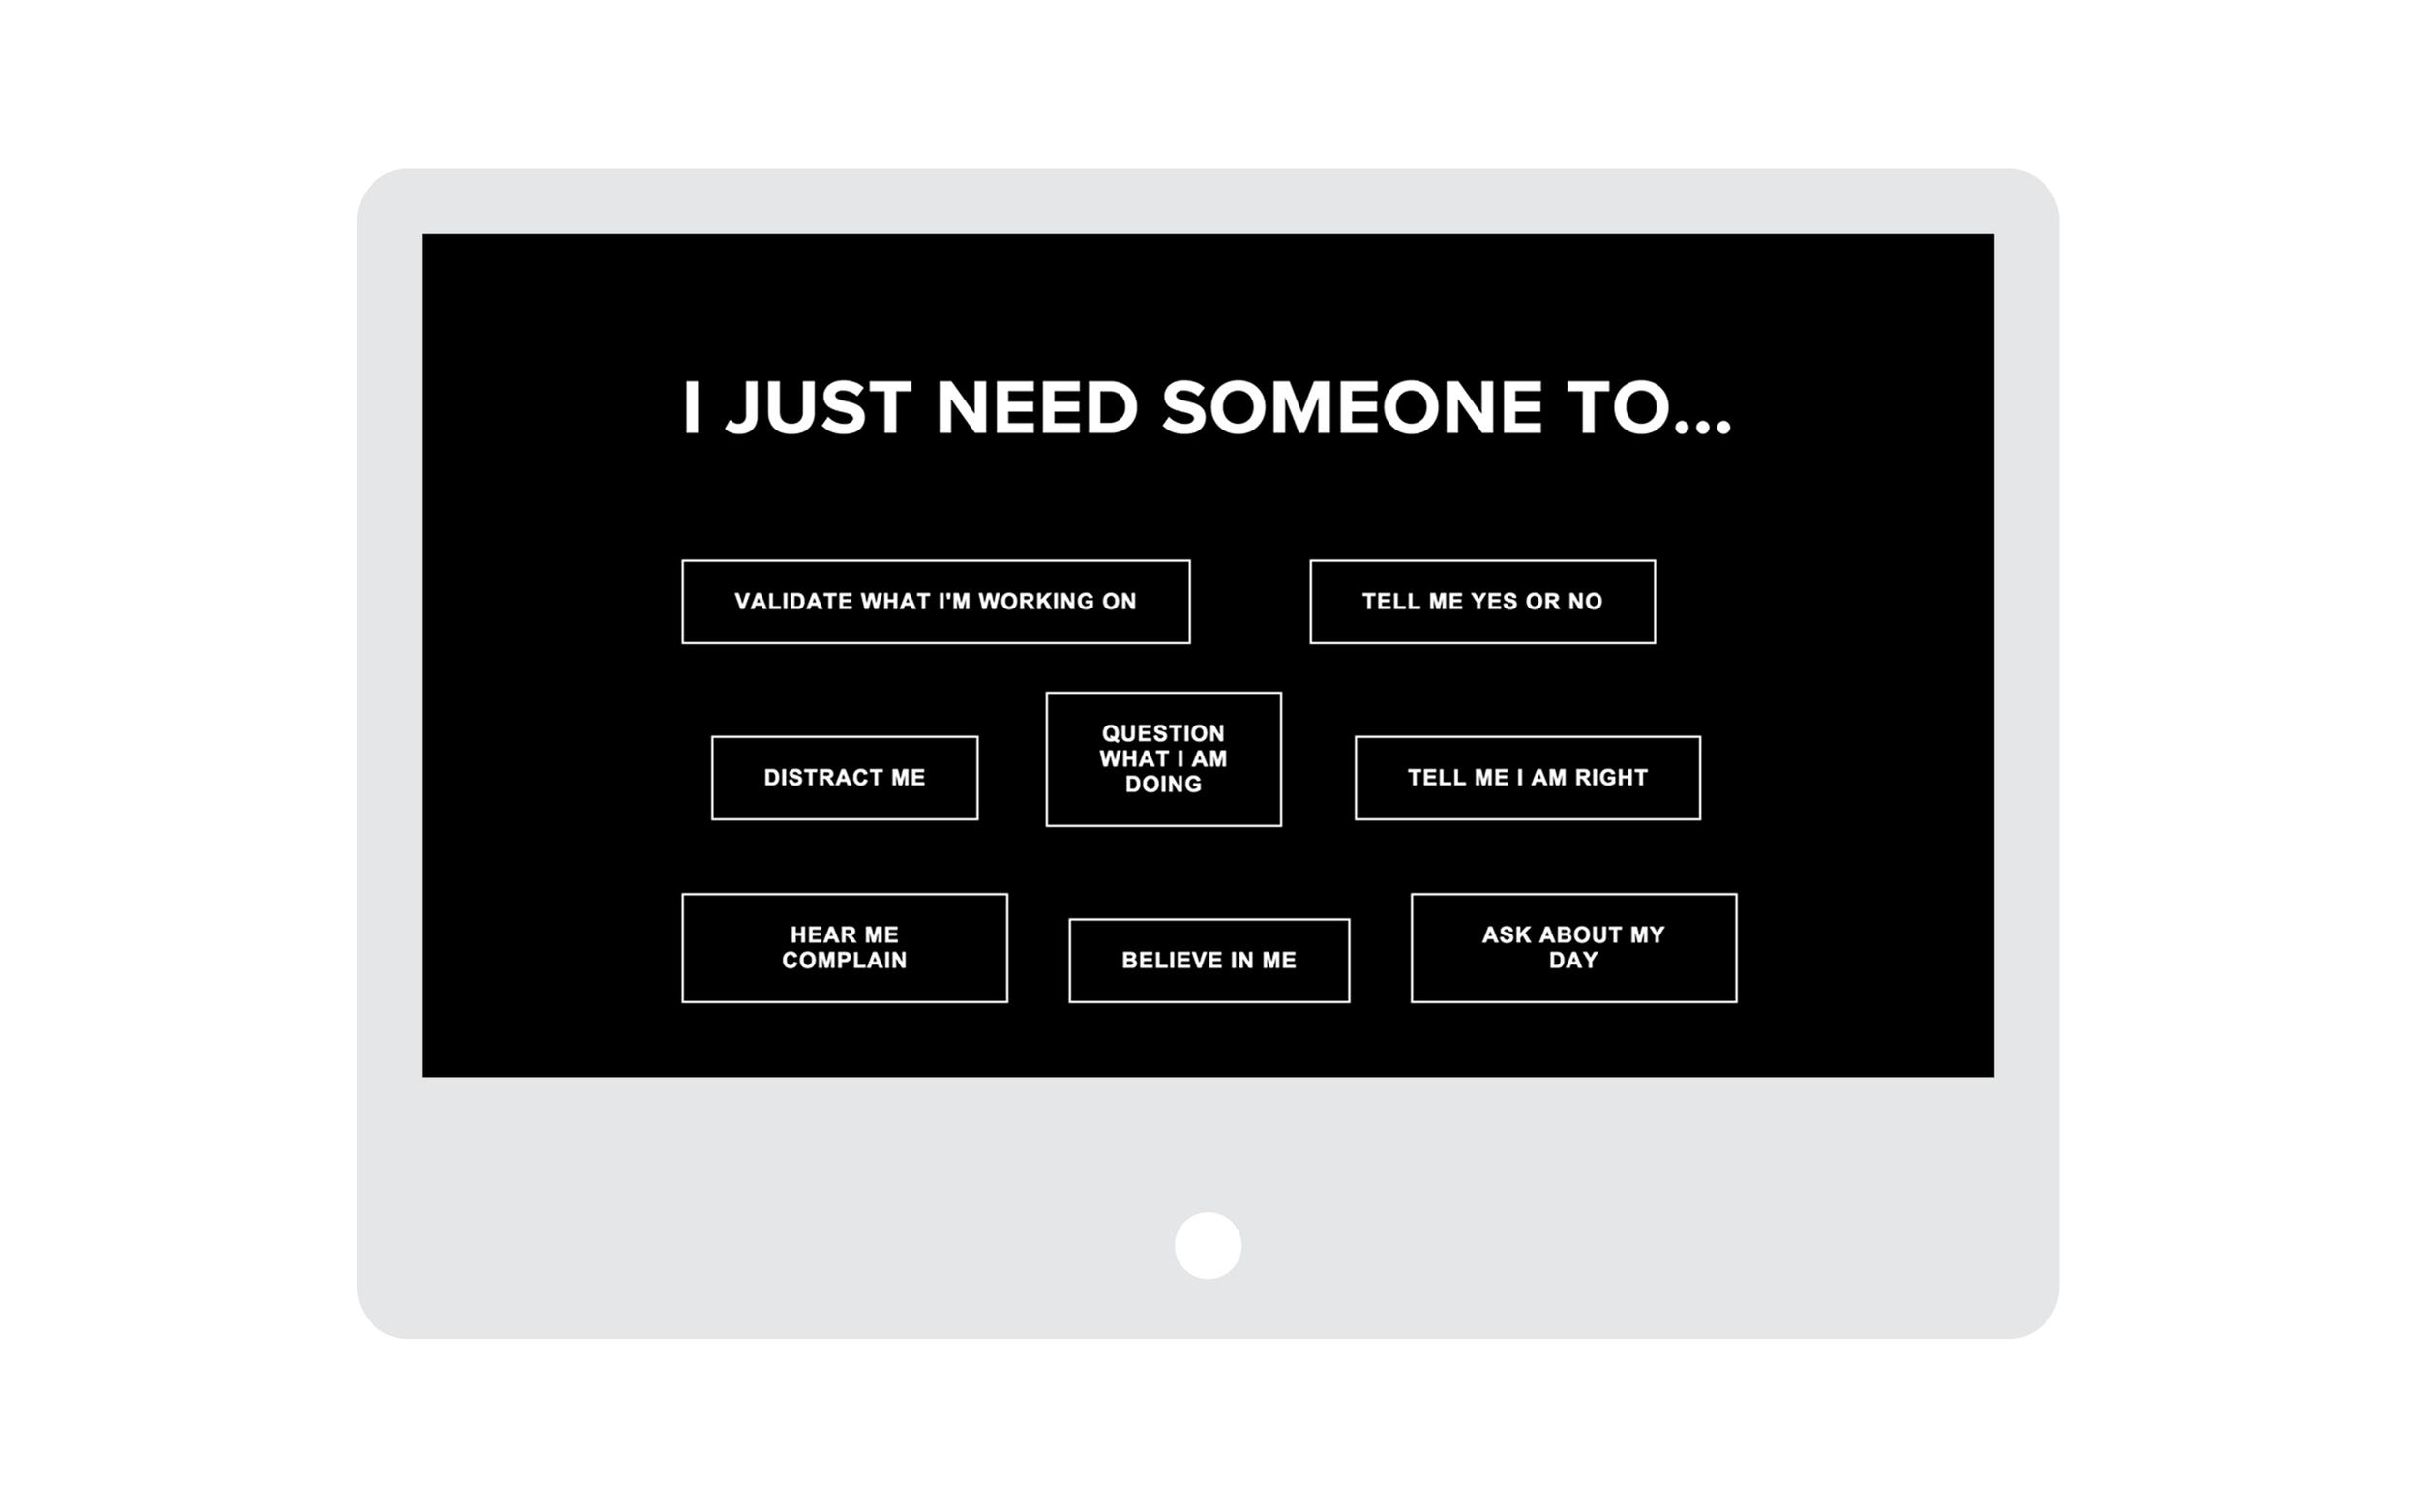 IJNST_ScreenShot.jpg